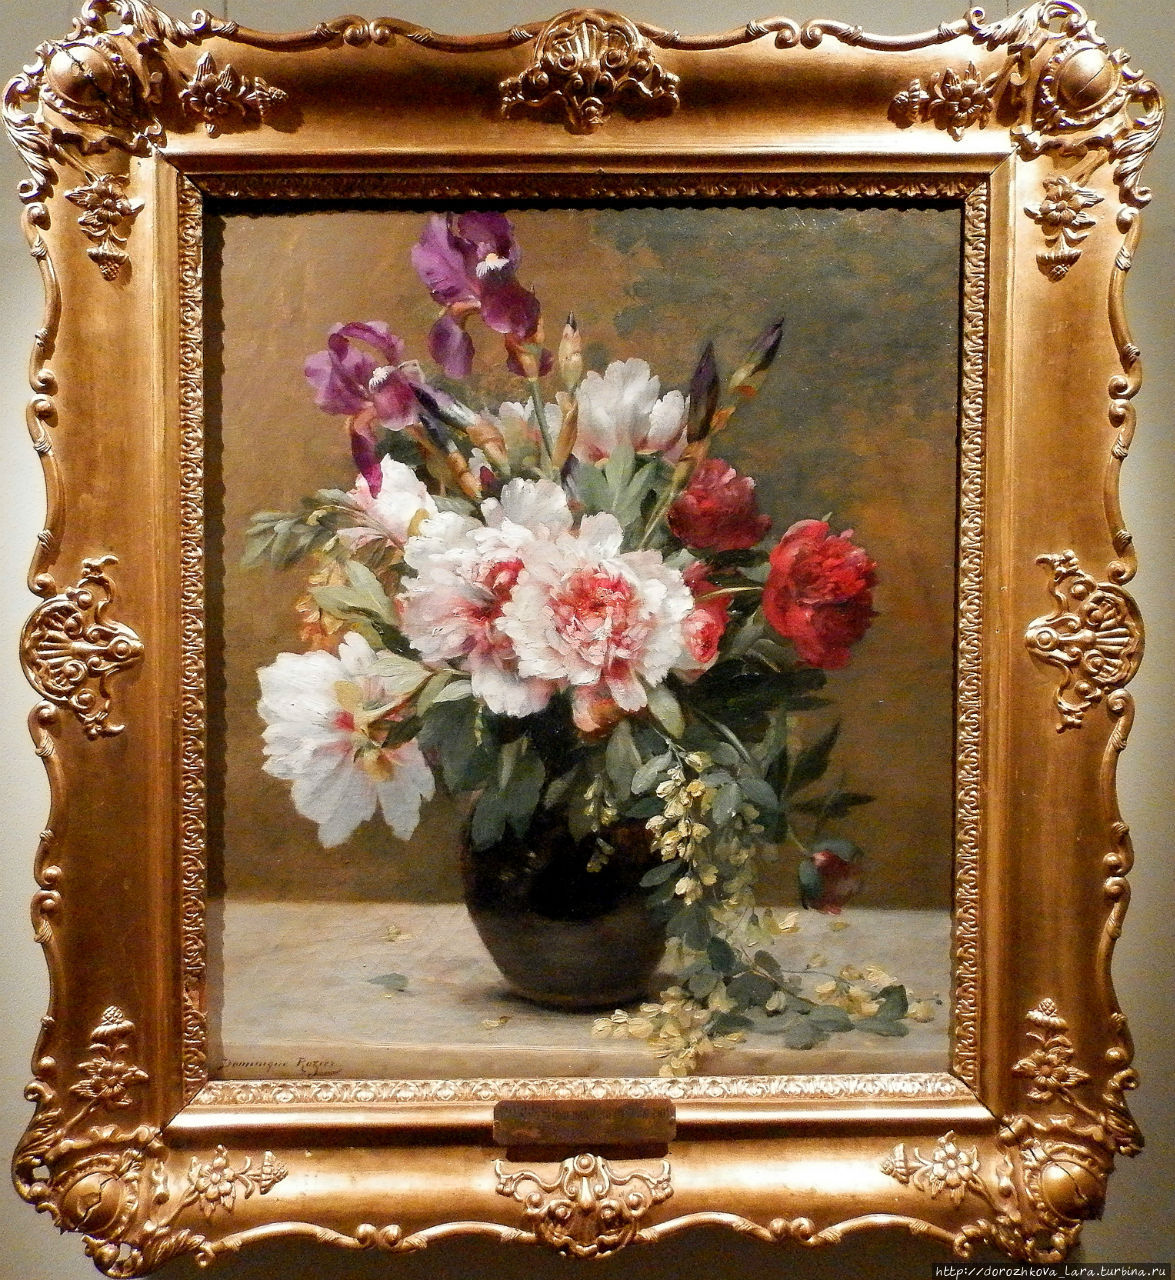 Розье, Доминик Юбер (1840-1901)